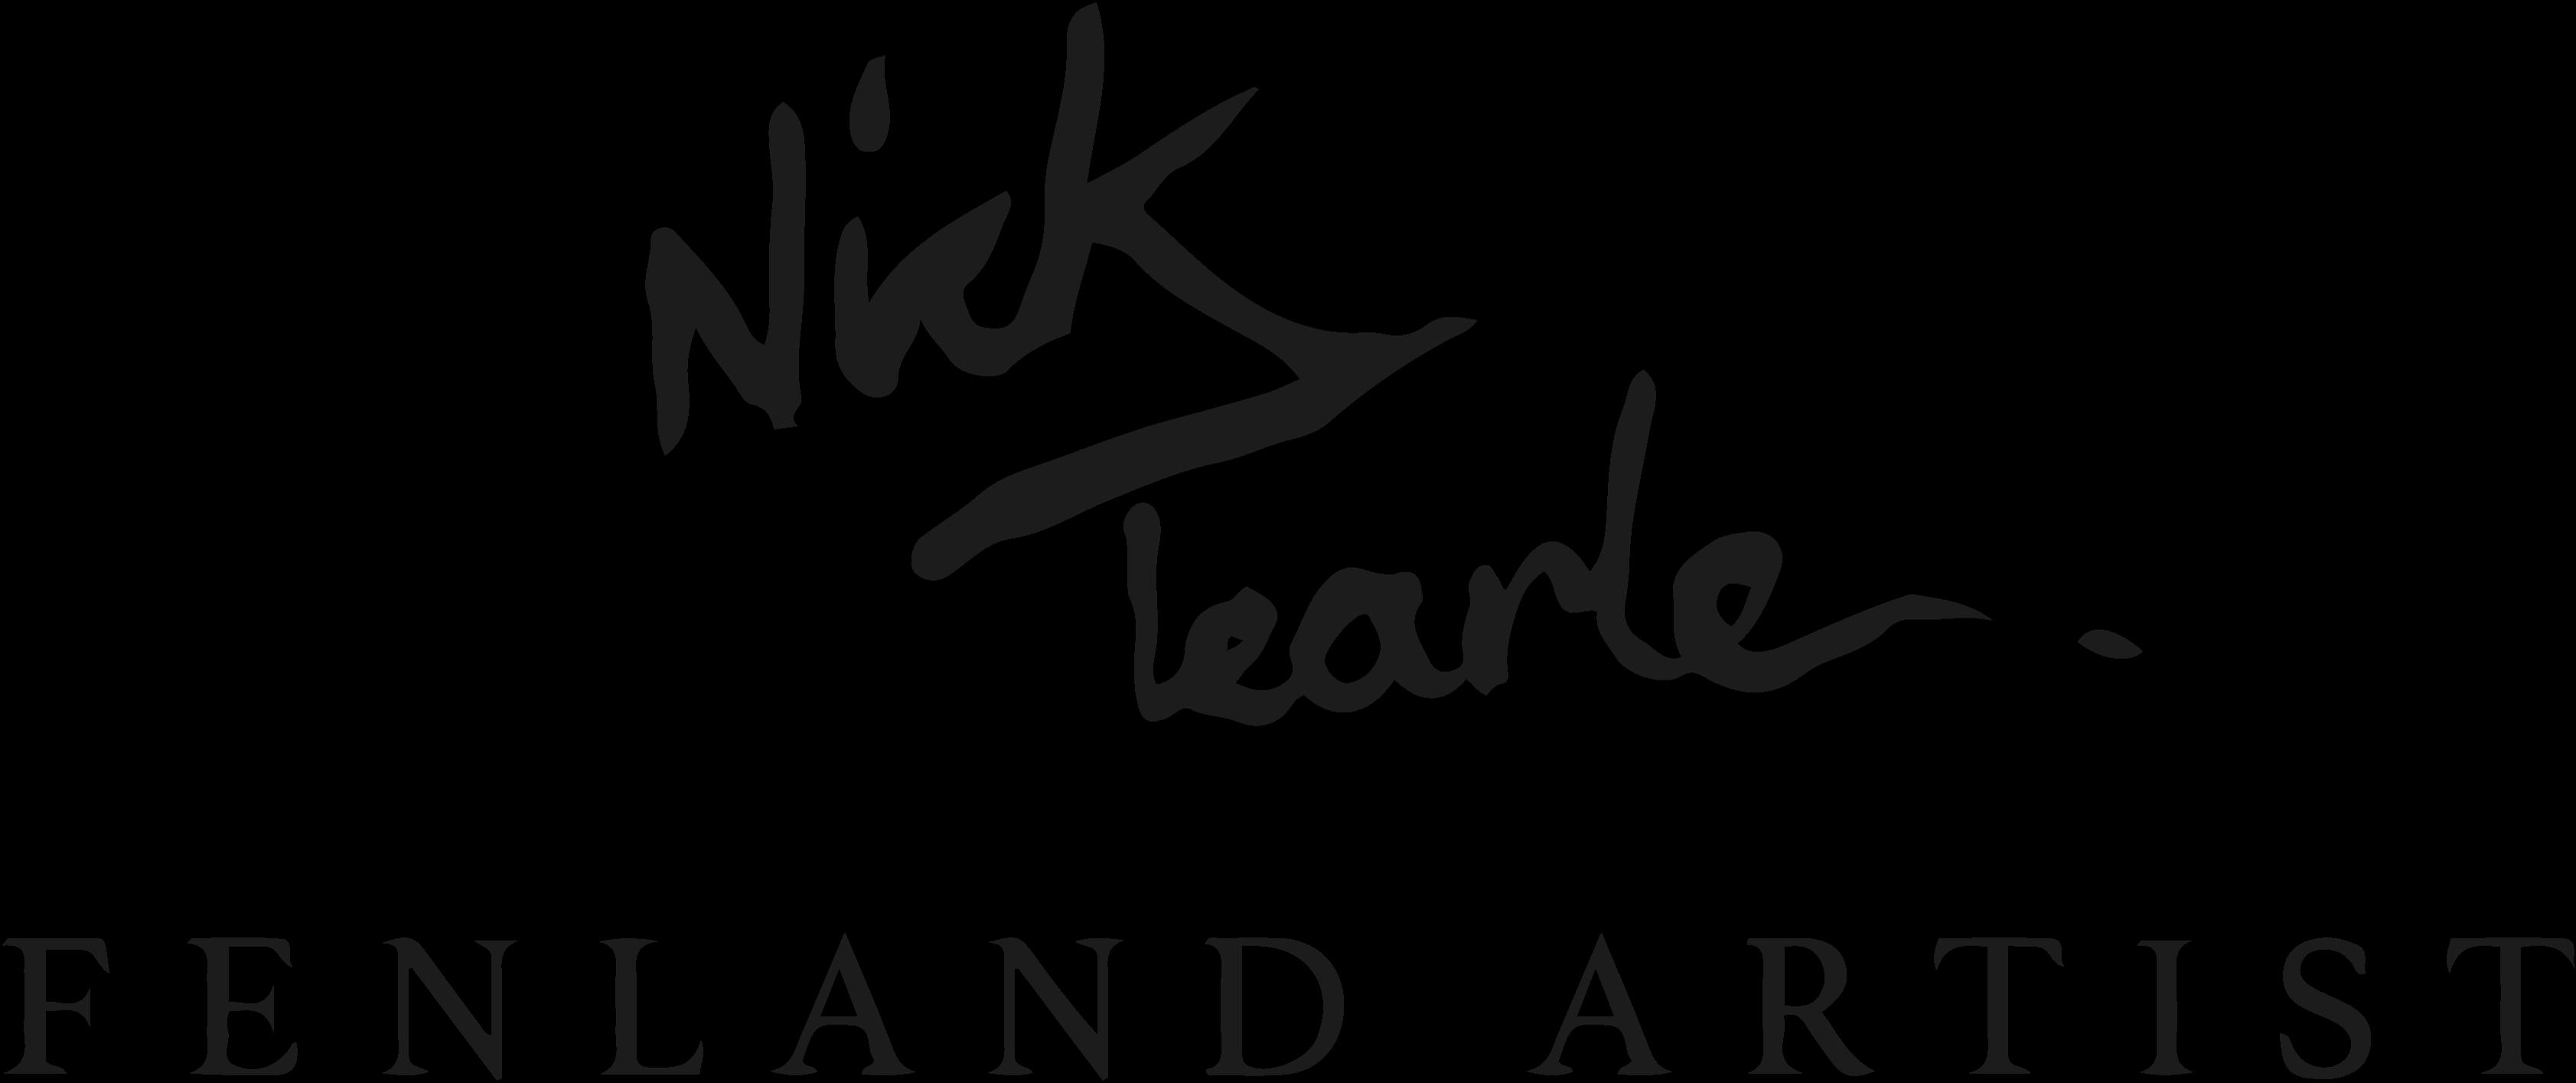 Nick Tearle Fenland Artist